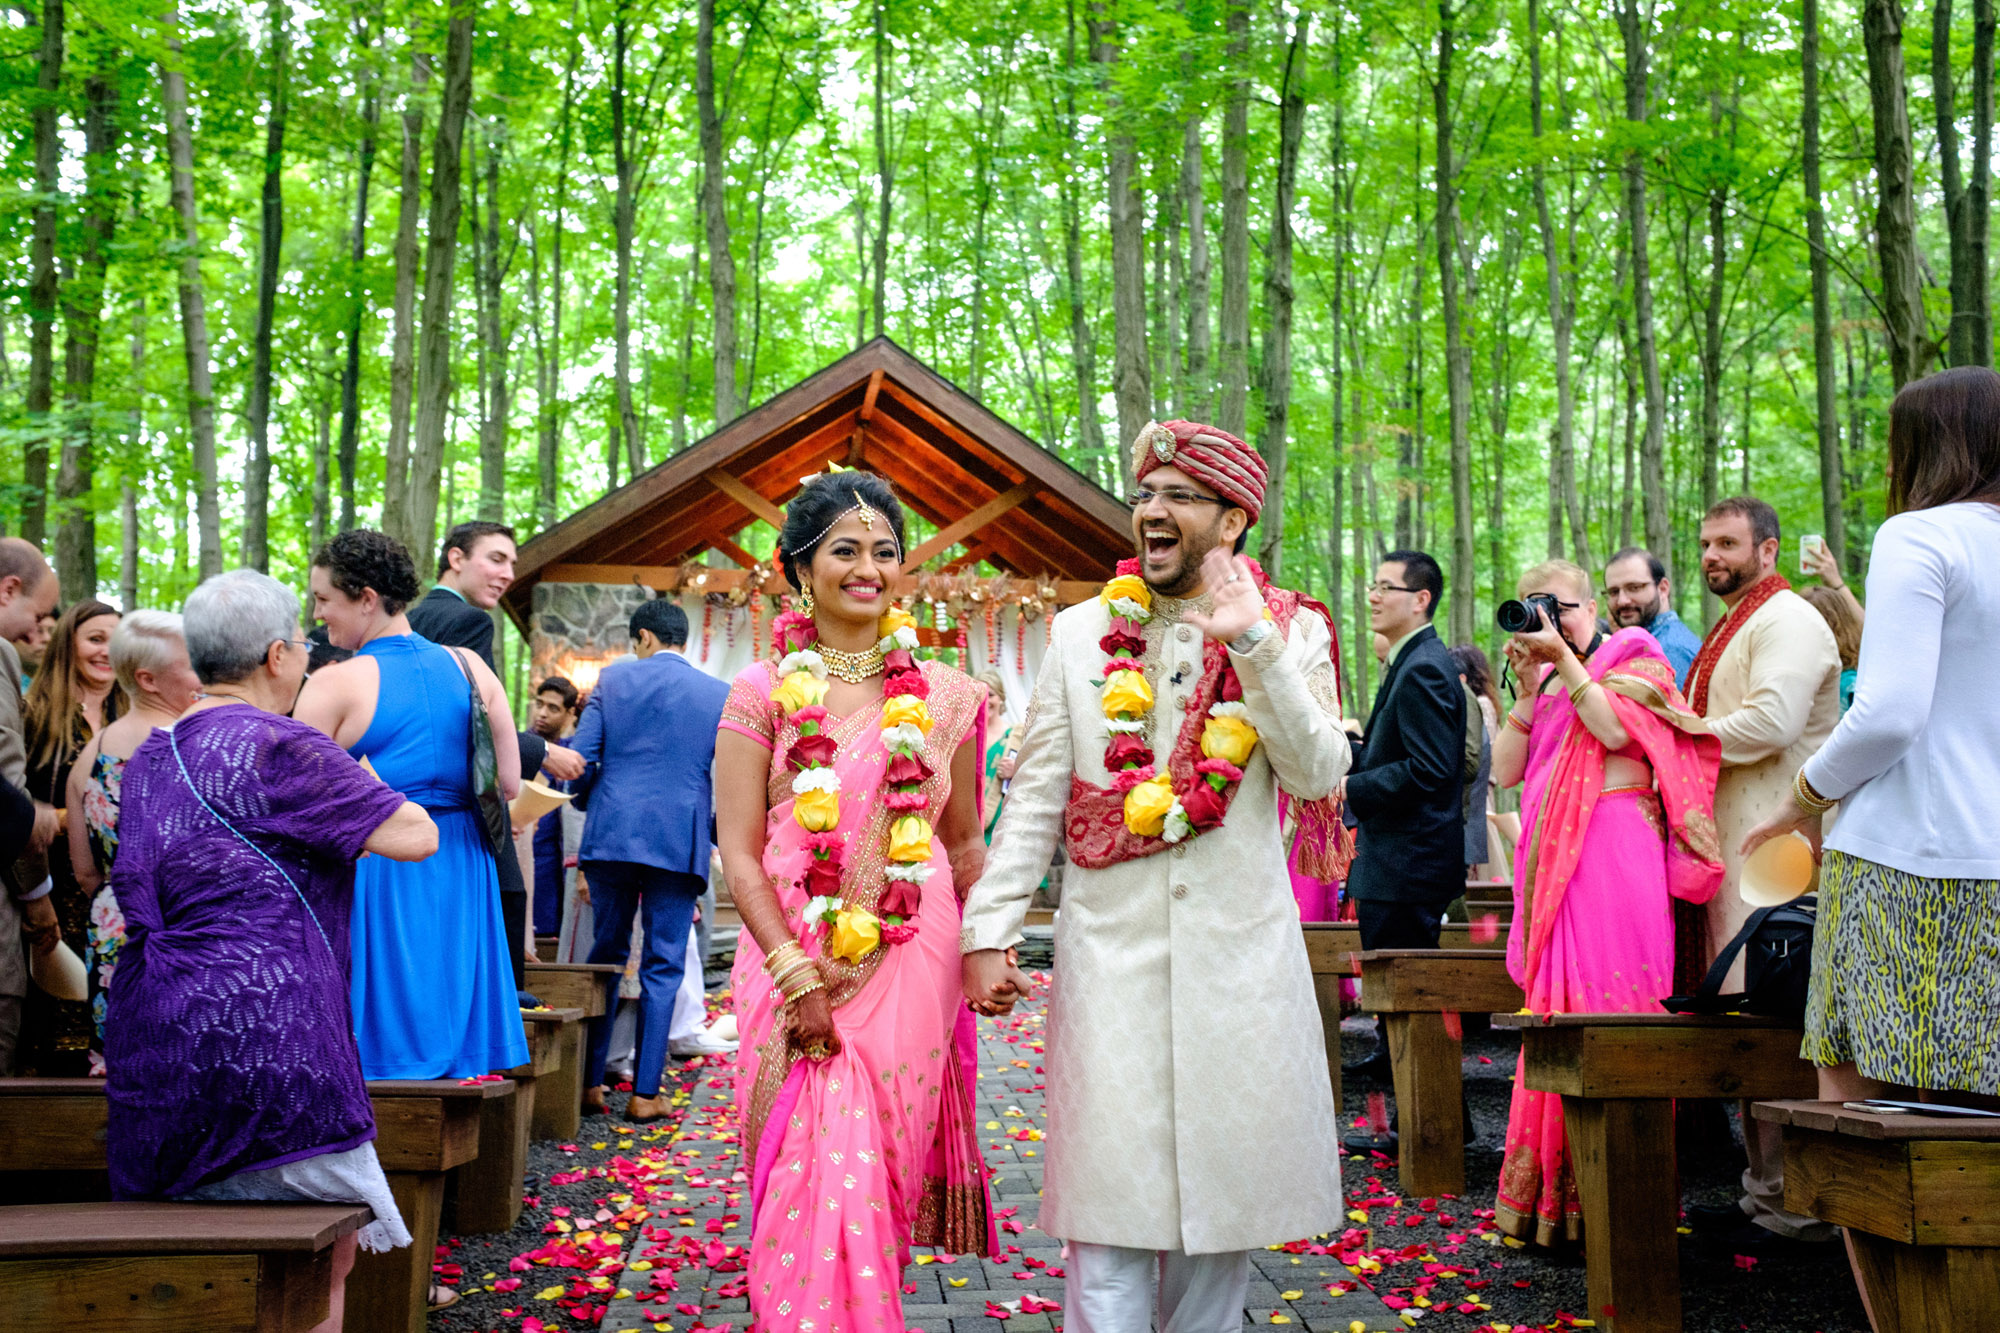 malika & nadir woodsgate stroudsmoor wedding 60